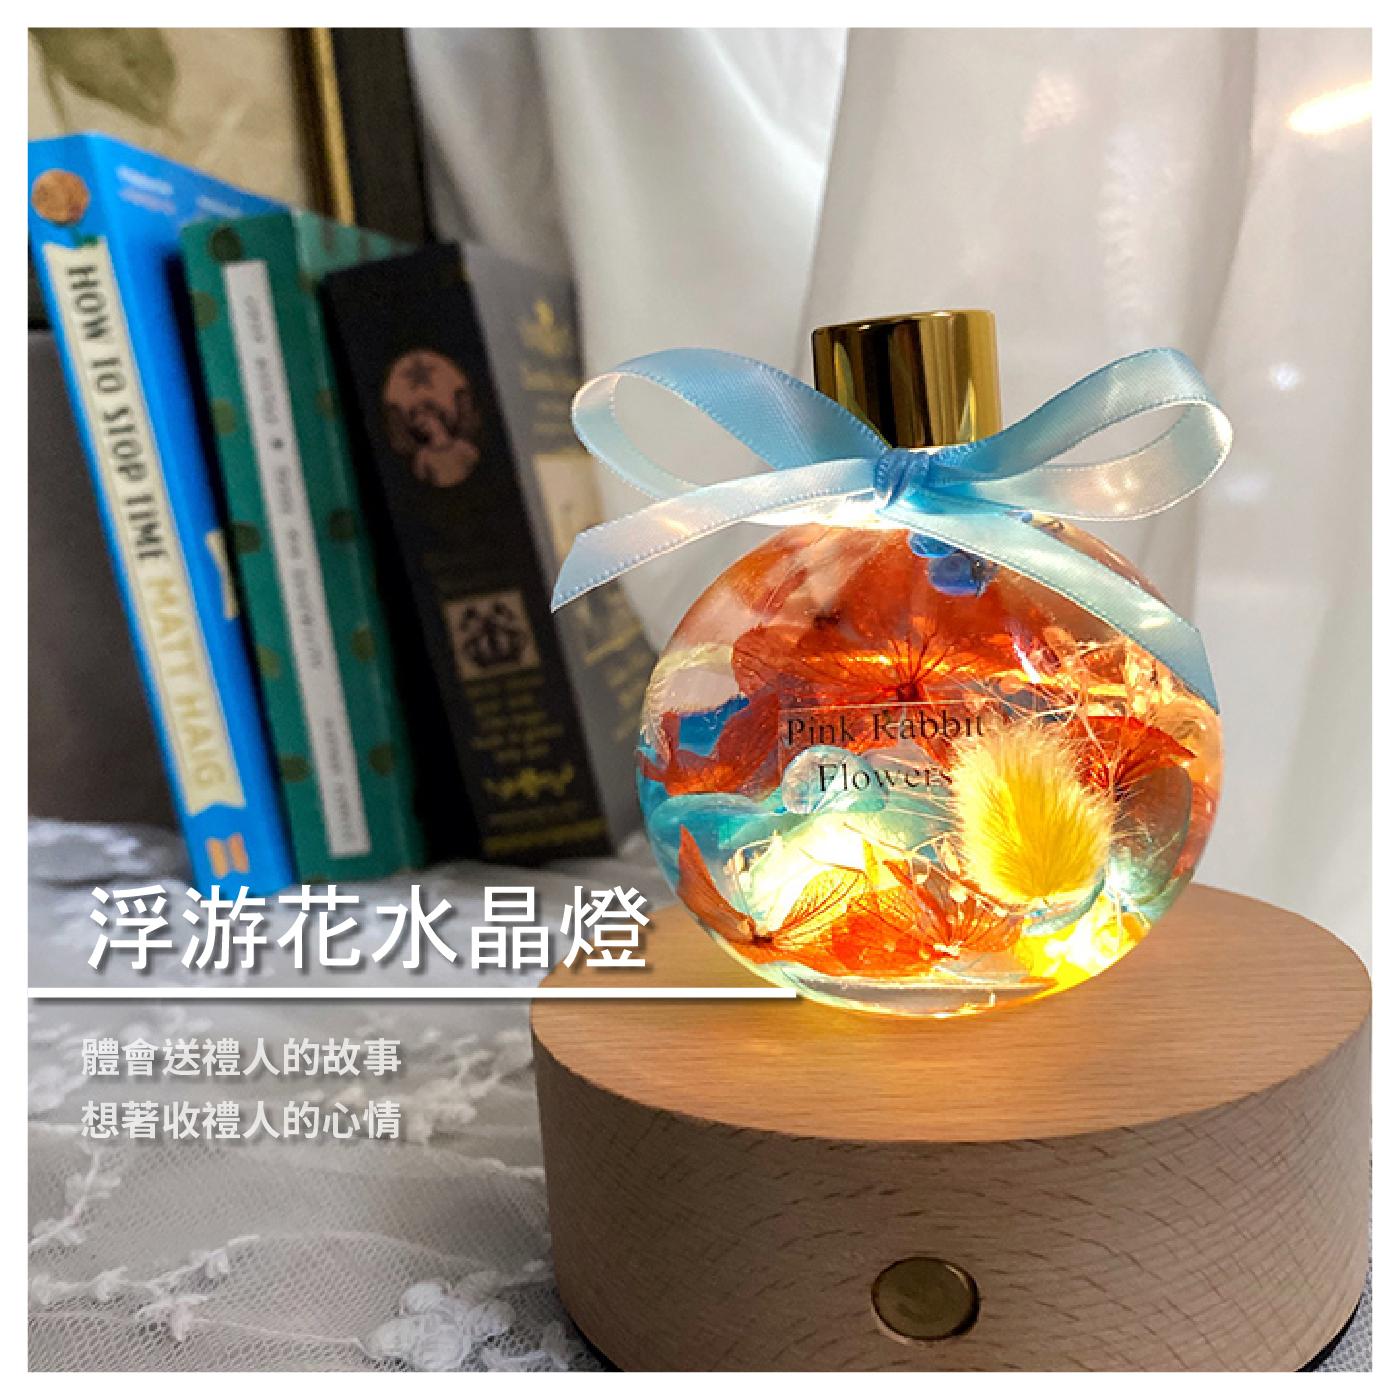 【Pink Rabbit Garden】『PRG永生花/乾燥花』浮游花水晶燈 / 花草 / 園藝